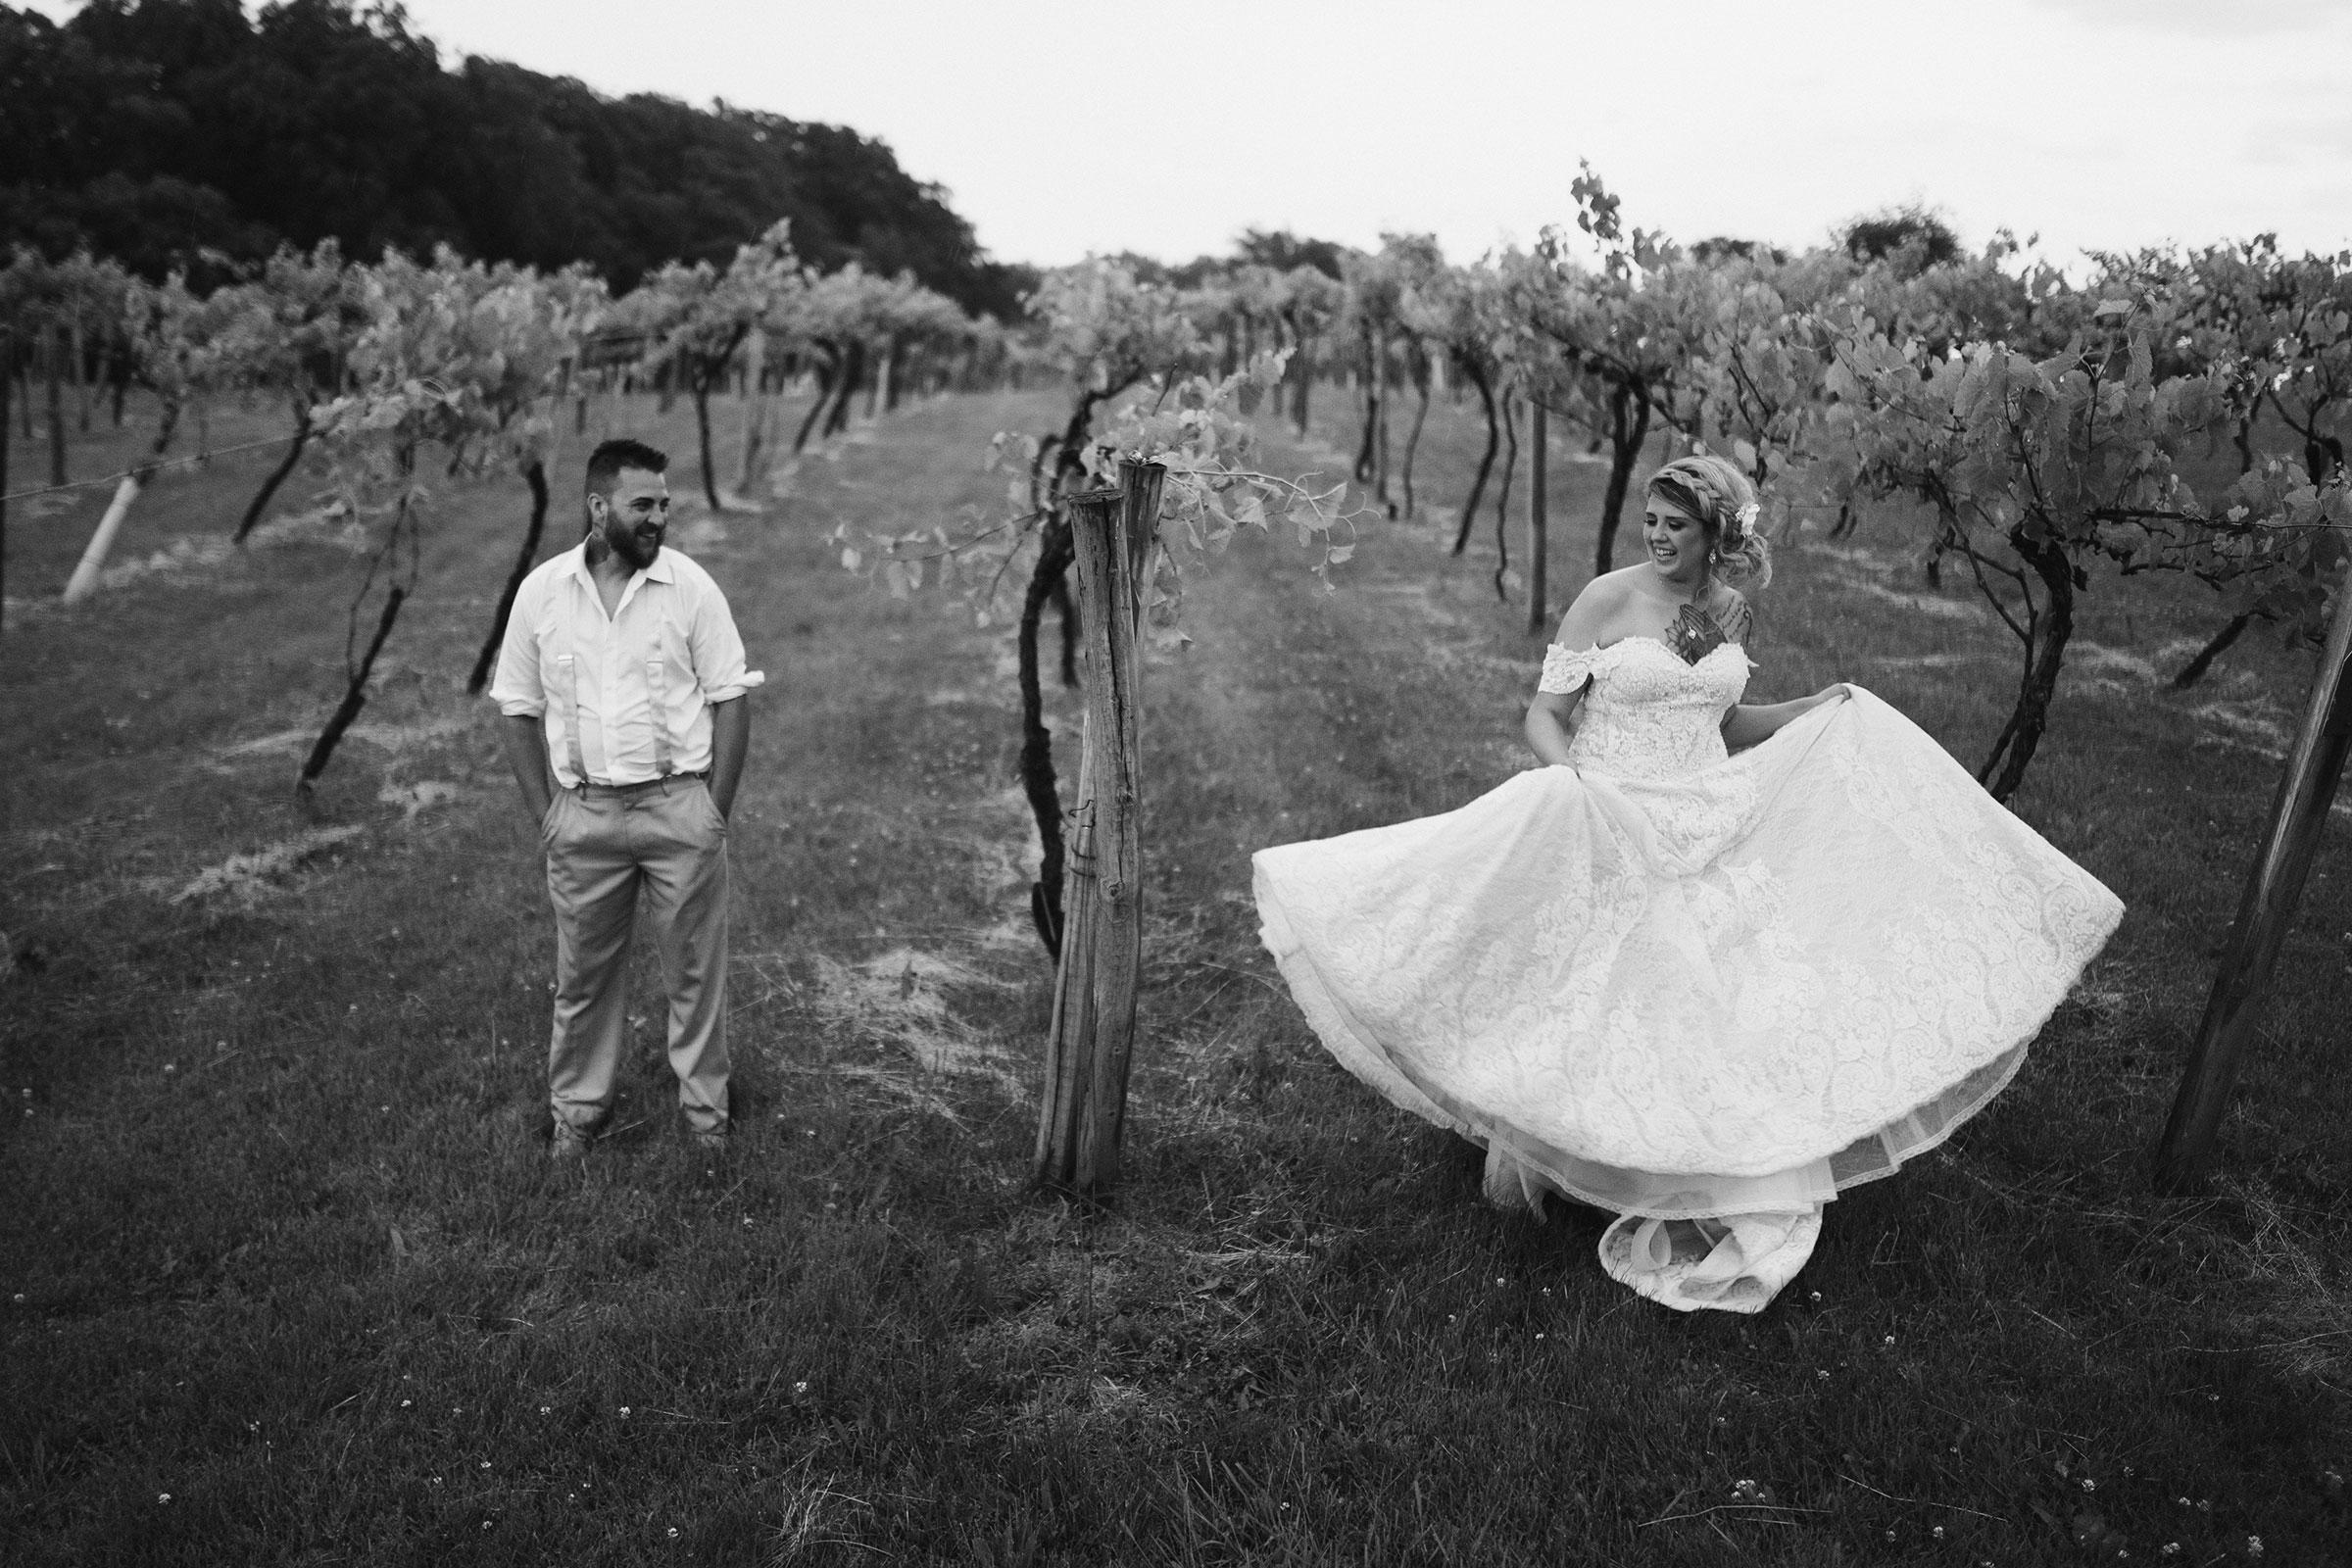 bride-twirling-dress-while-groom-watching-in-vineyard-wedding-summerset-winery-indianola-iowa-raelyn-ramey-photography.jpg